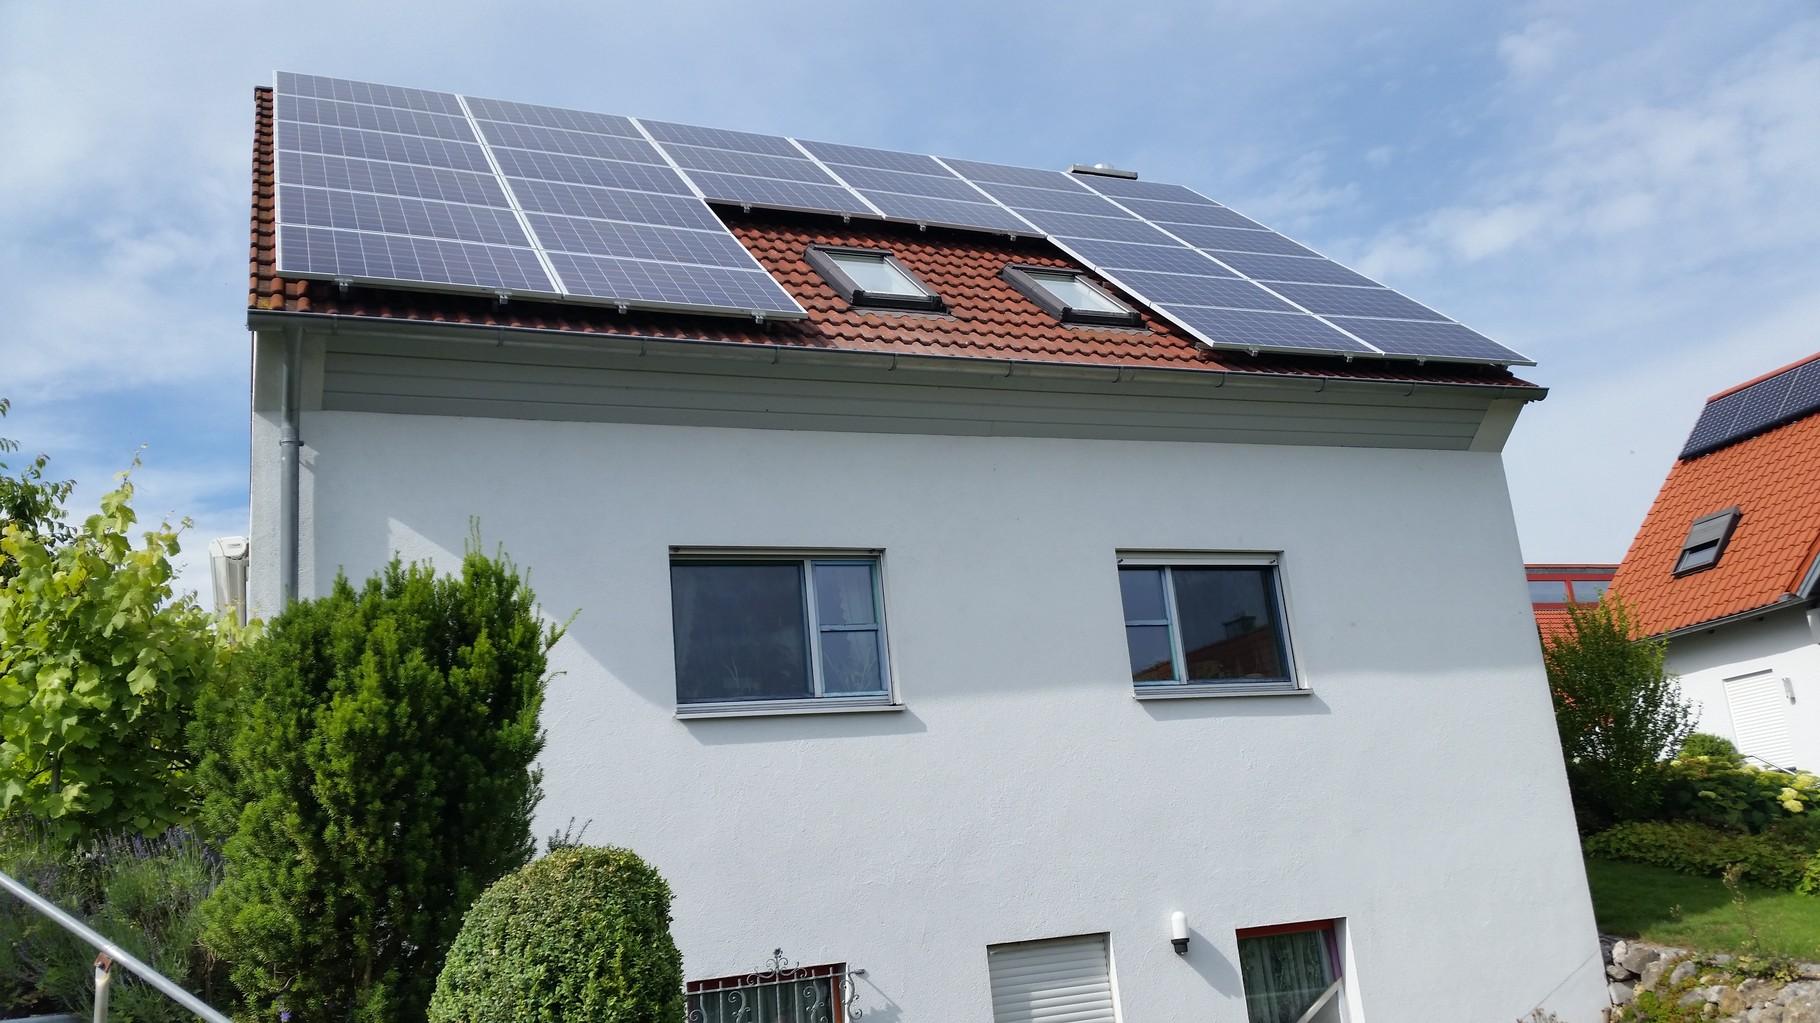 7,5 kWp Photovoltaikanlage 93077 Bad Abbach SHARP Modulen